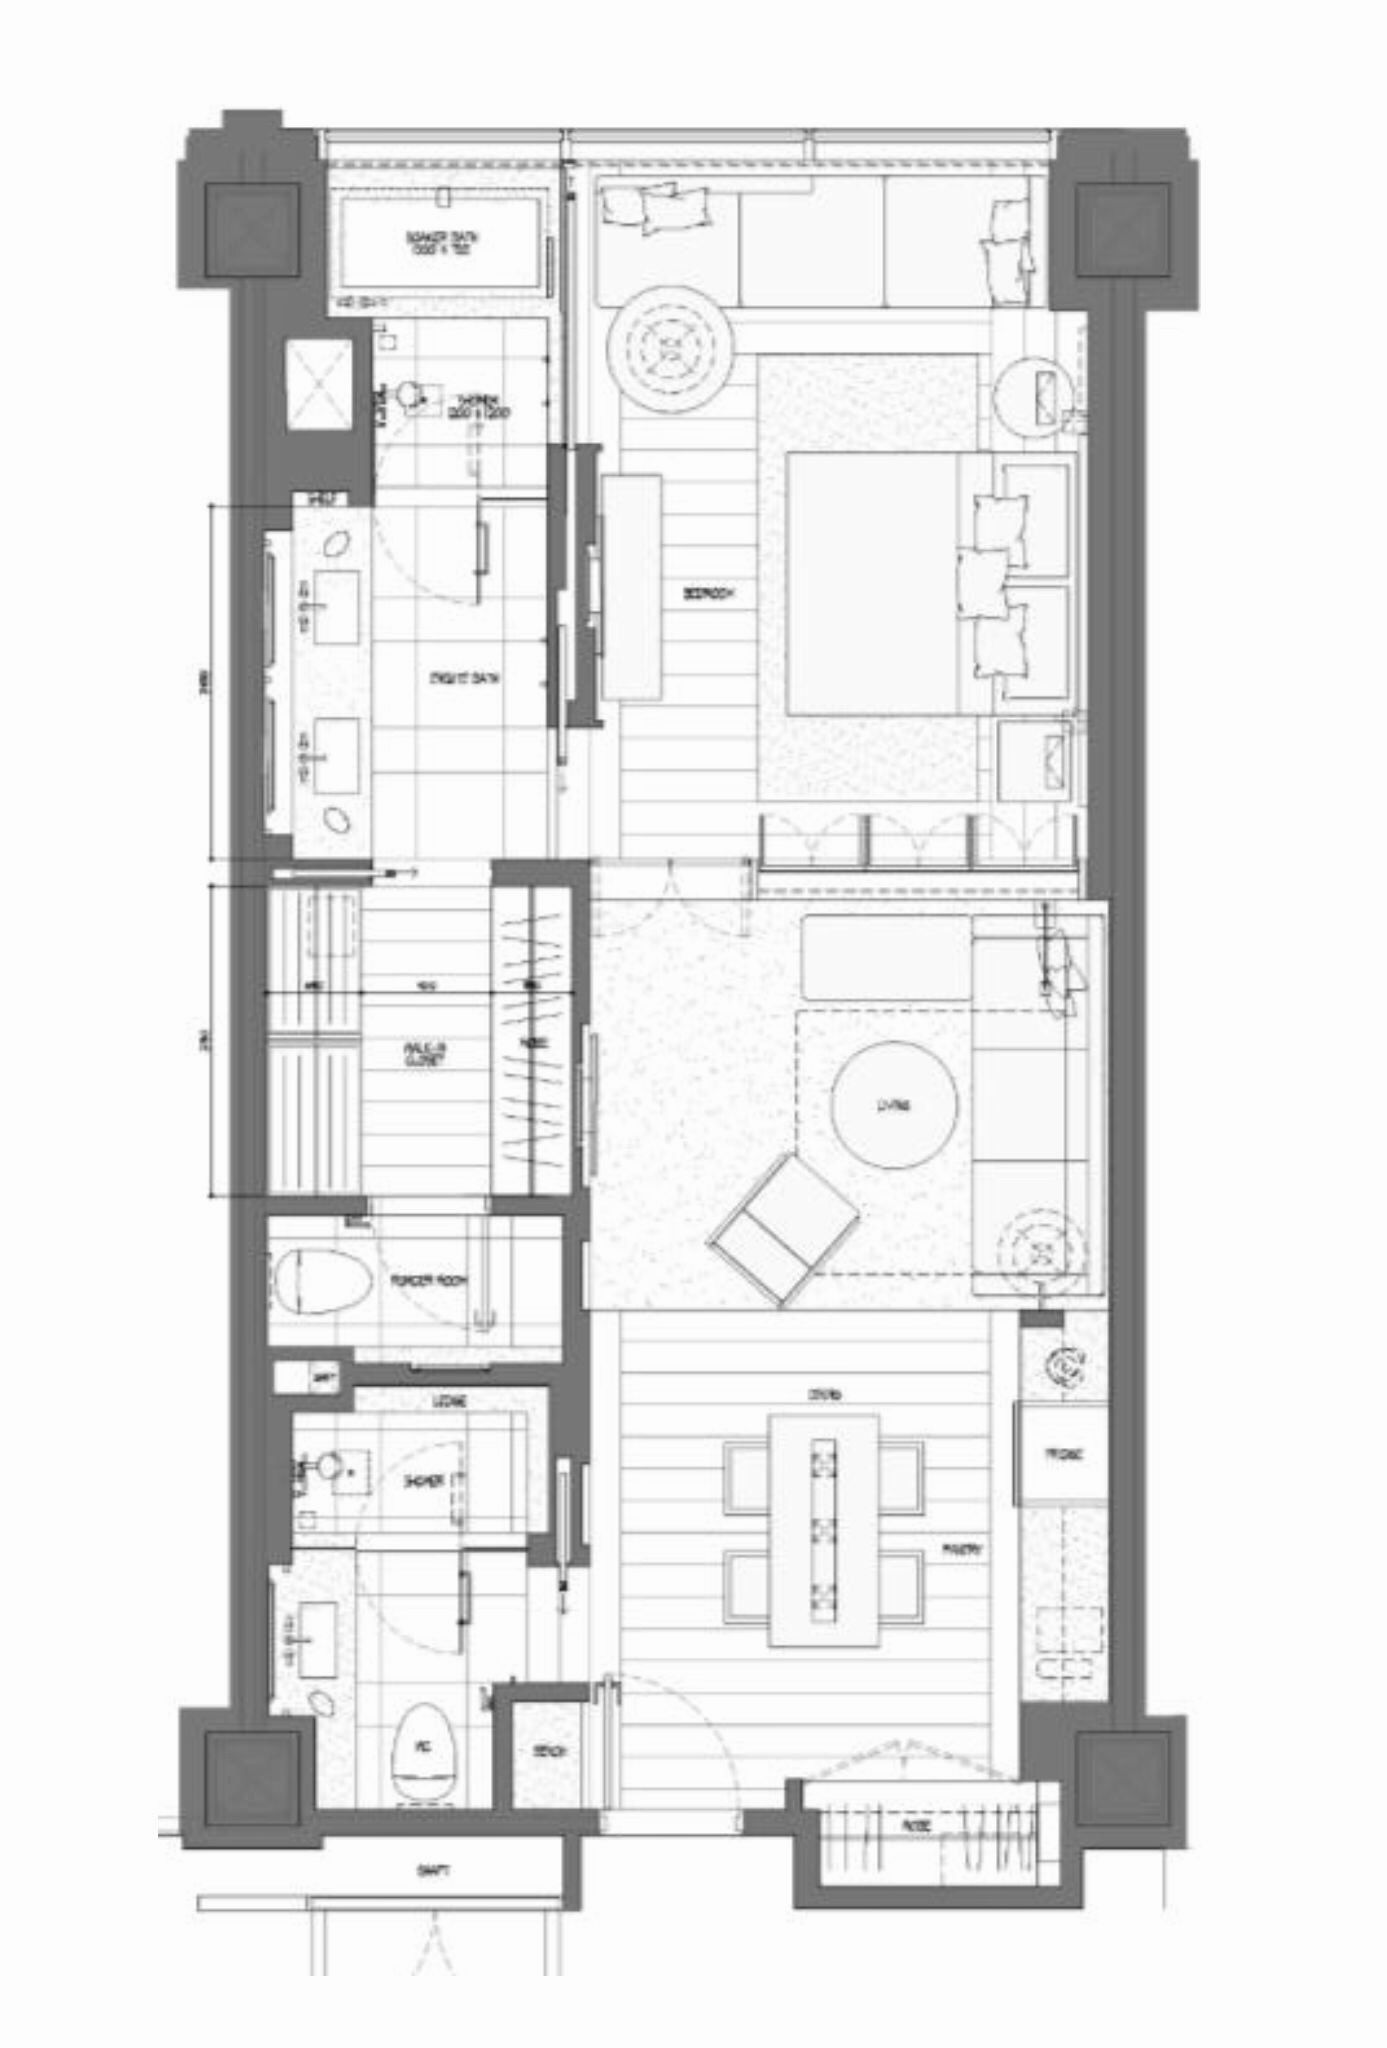 Park Hyatt Niseko Hanazono Park Room 65 Sqm Hotel Room Design Plan Hotel Suite Floor Plan Hotel Room Plan